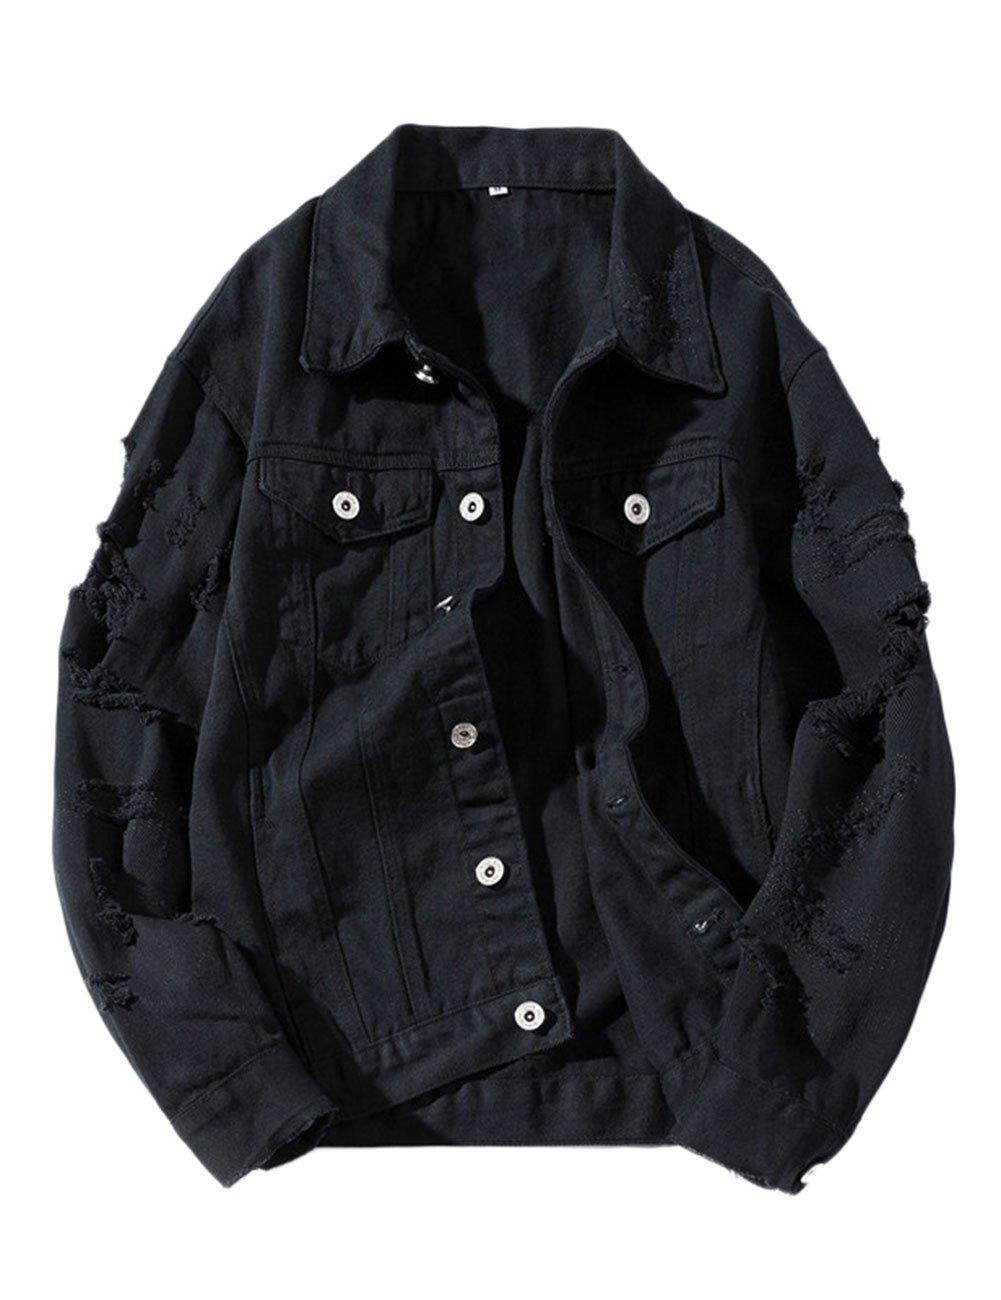 ZLSLZ Womens Girls Cute Solid Distressed Ripped Long Sleeve Denim Jean Jacket Coat Plus Size Black US L